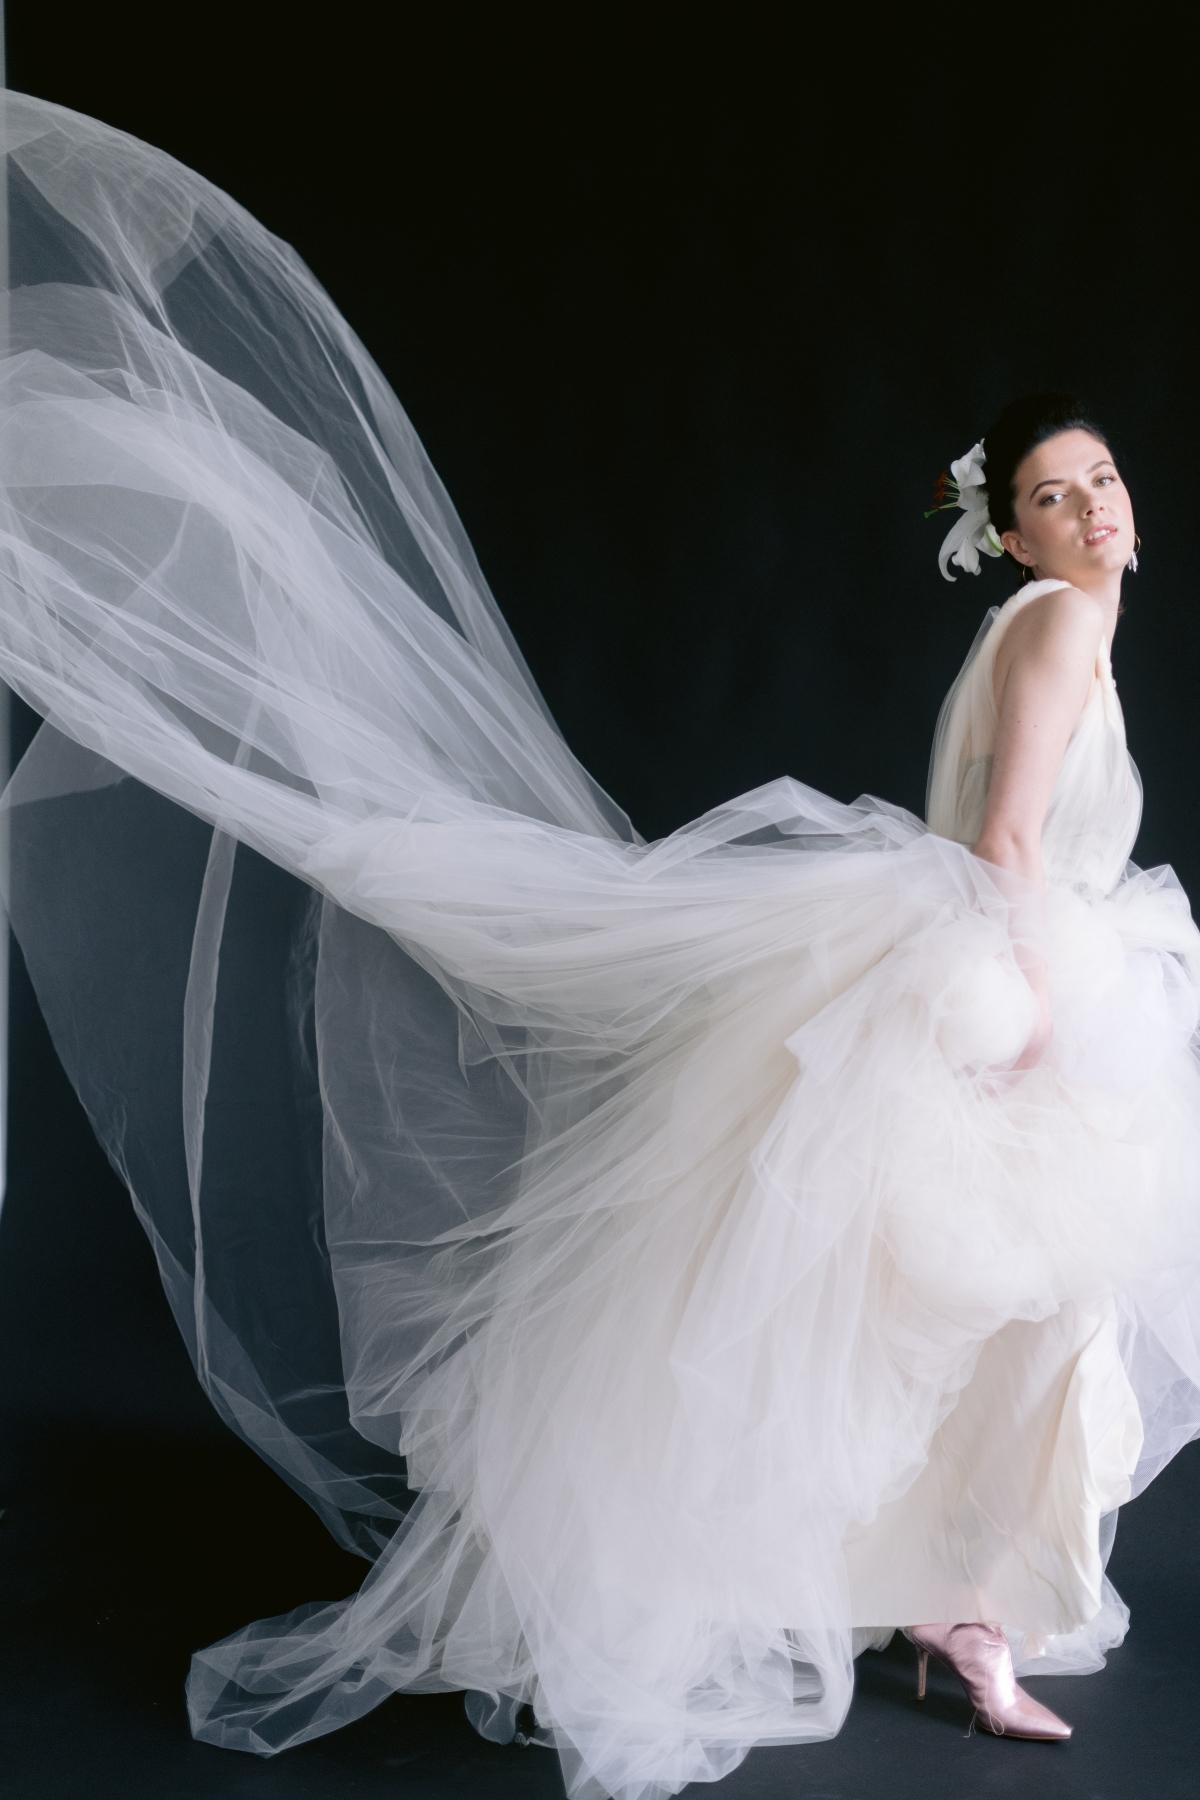 Laura Lanzerotte Bridal Danielle Heinson Photography 68